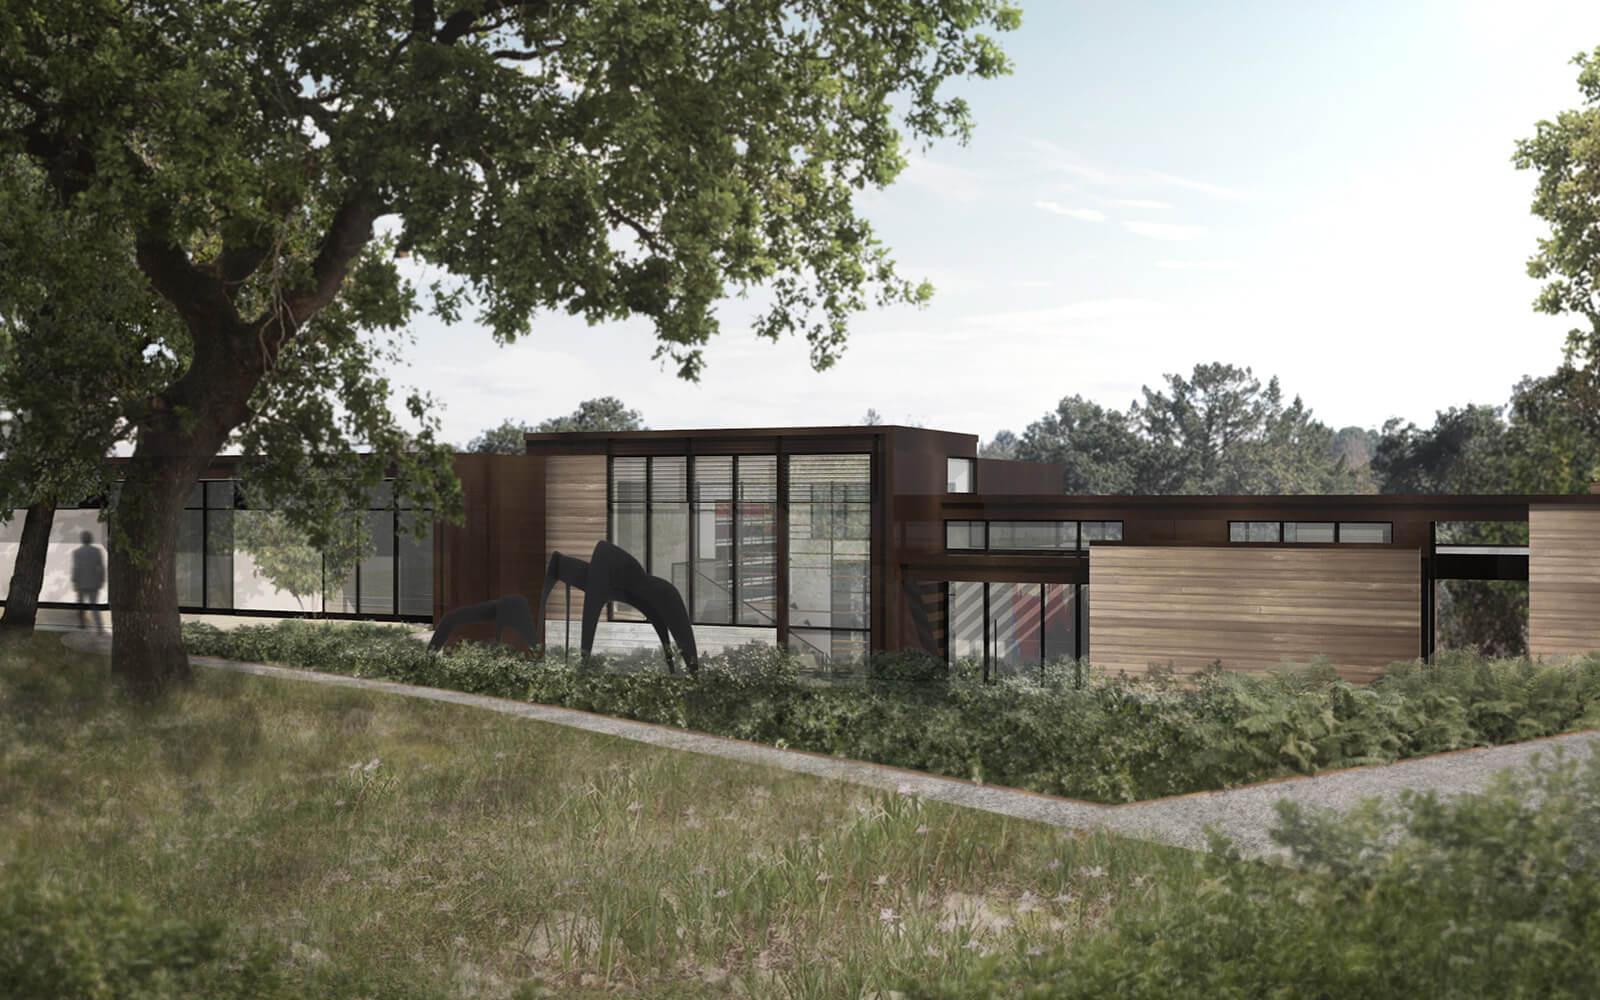 studio vara residential woodside i landscape views